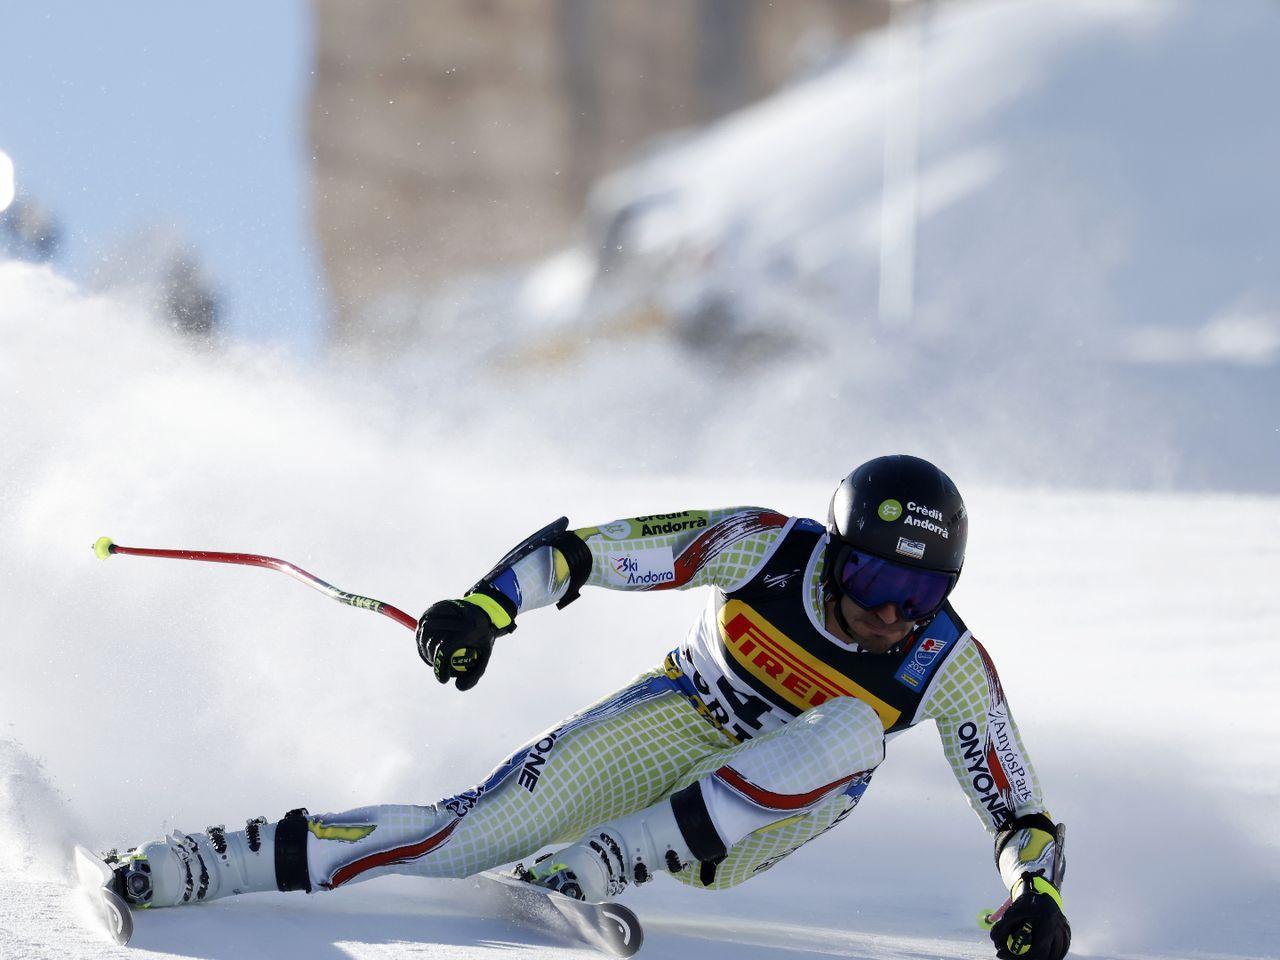 Cortina 2021   Prove discesa libera uomini - Audio ambiente - Eurosport